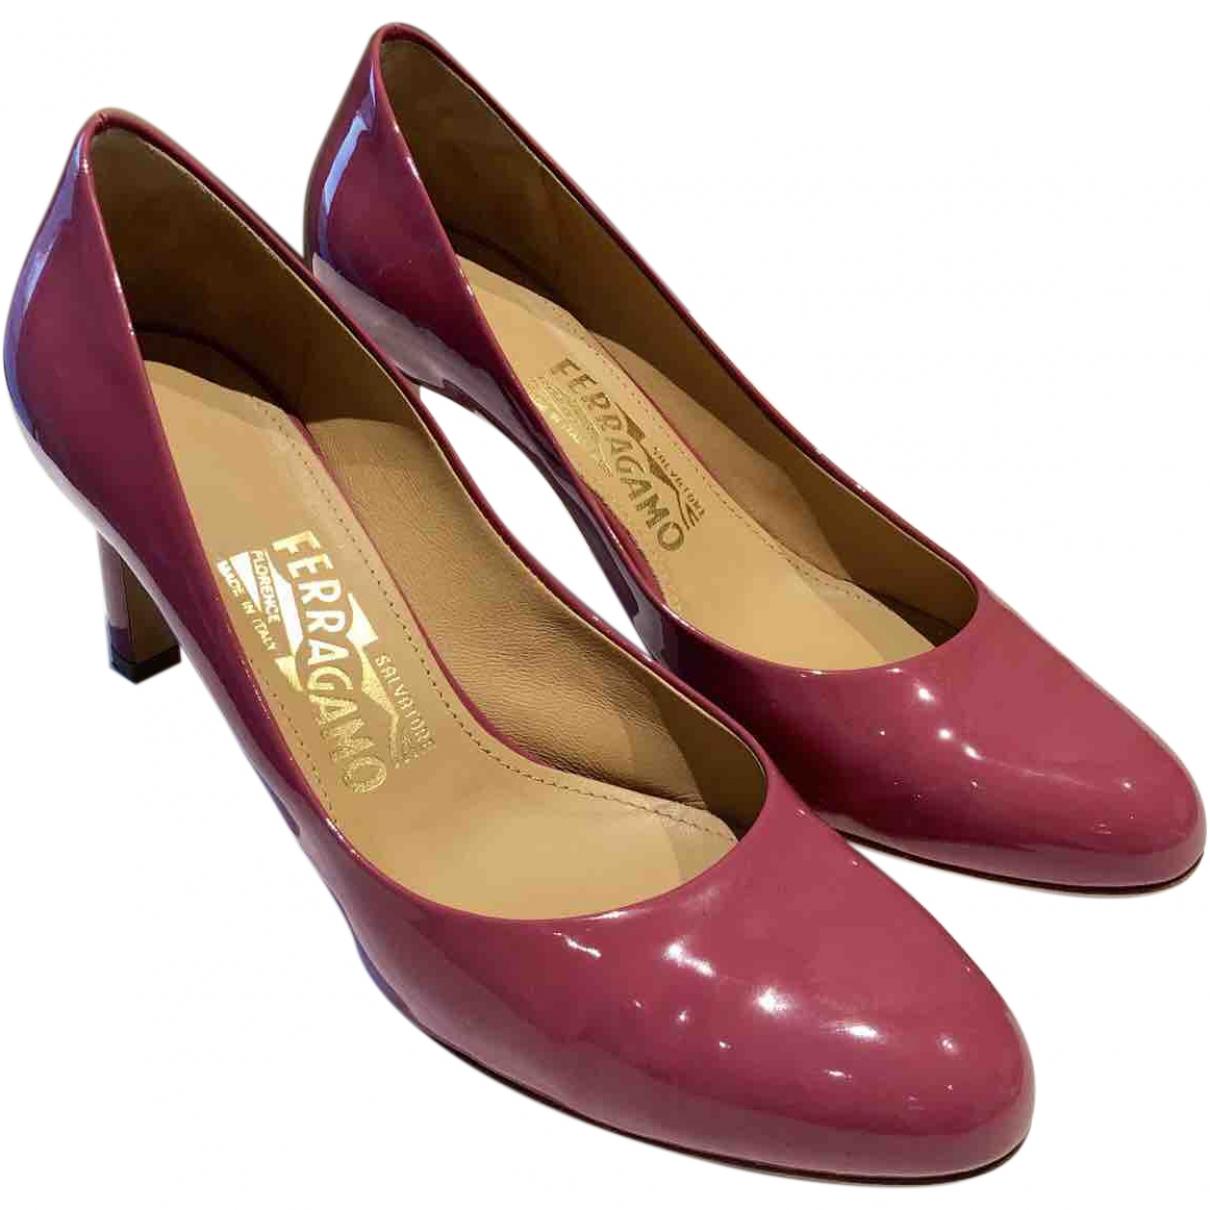 Salvatore Ferragamo \N Pink Patent leather Heels for Women 37.5 EU